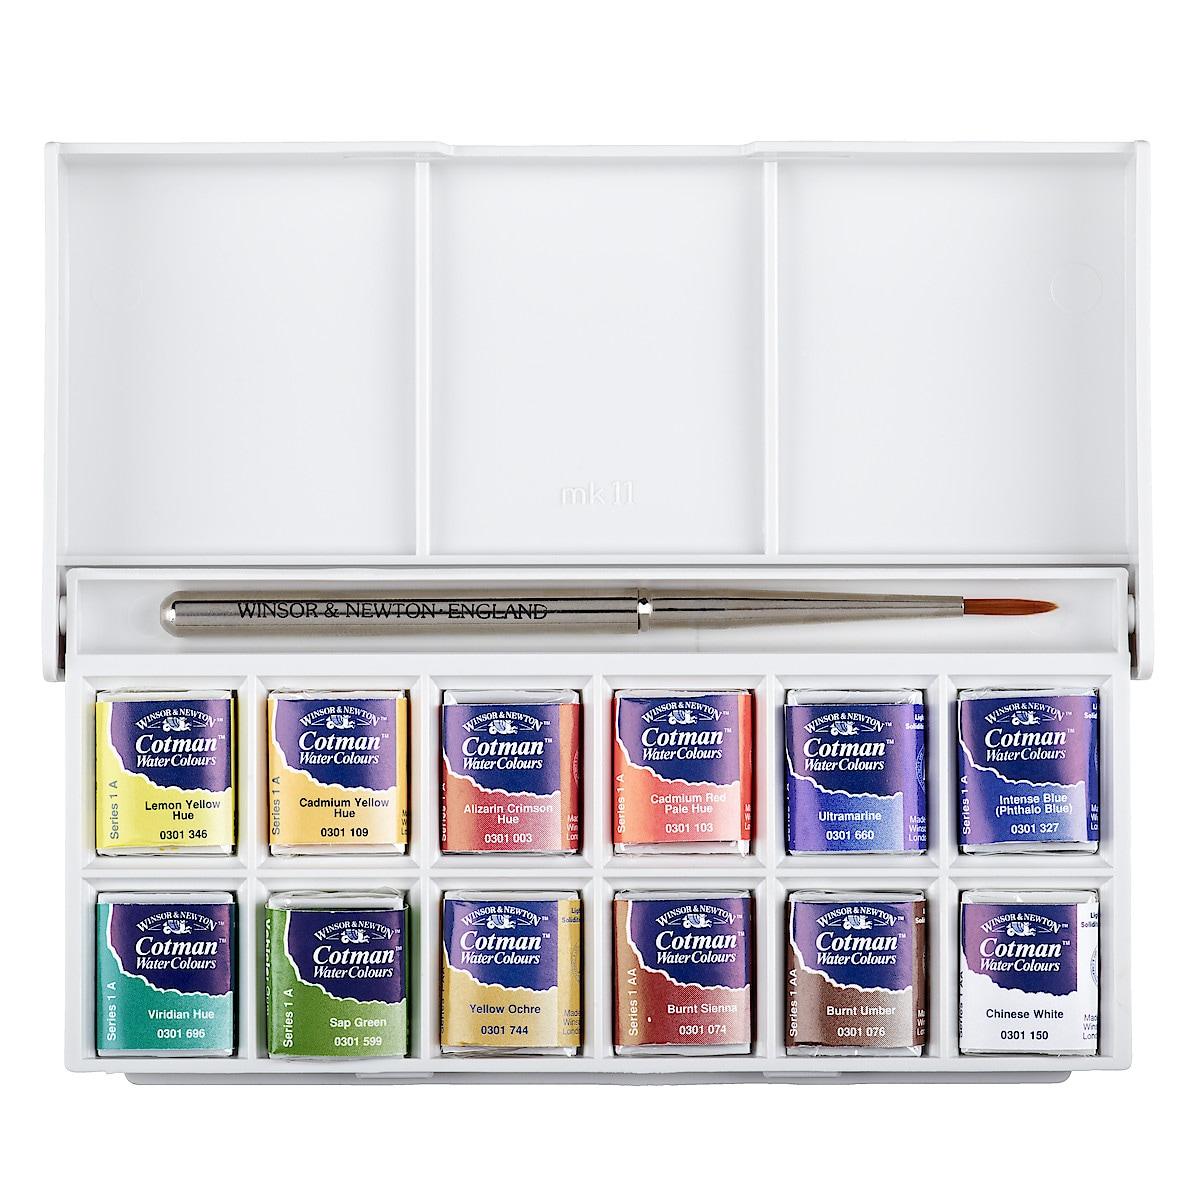 W&N Cotman Sketcher's Pocket Box